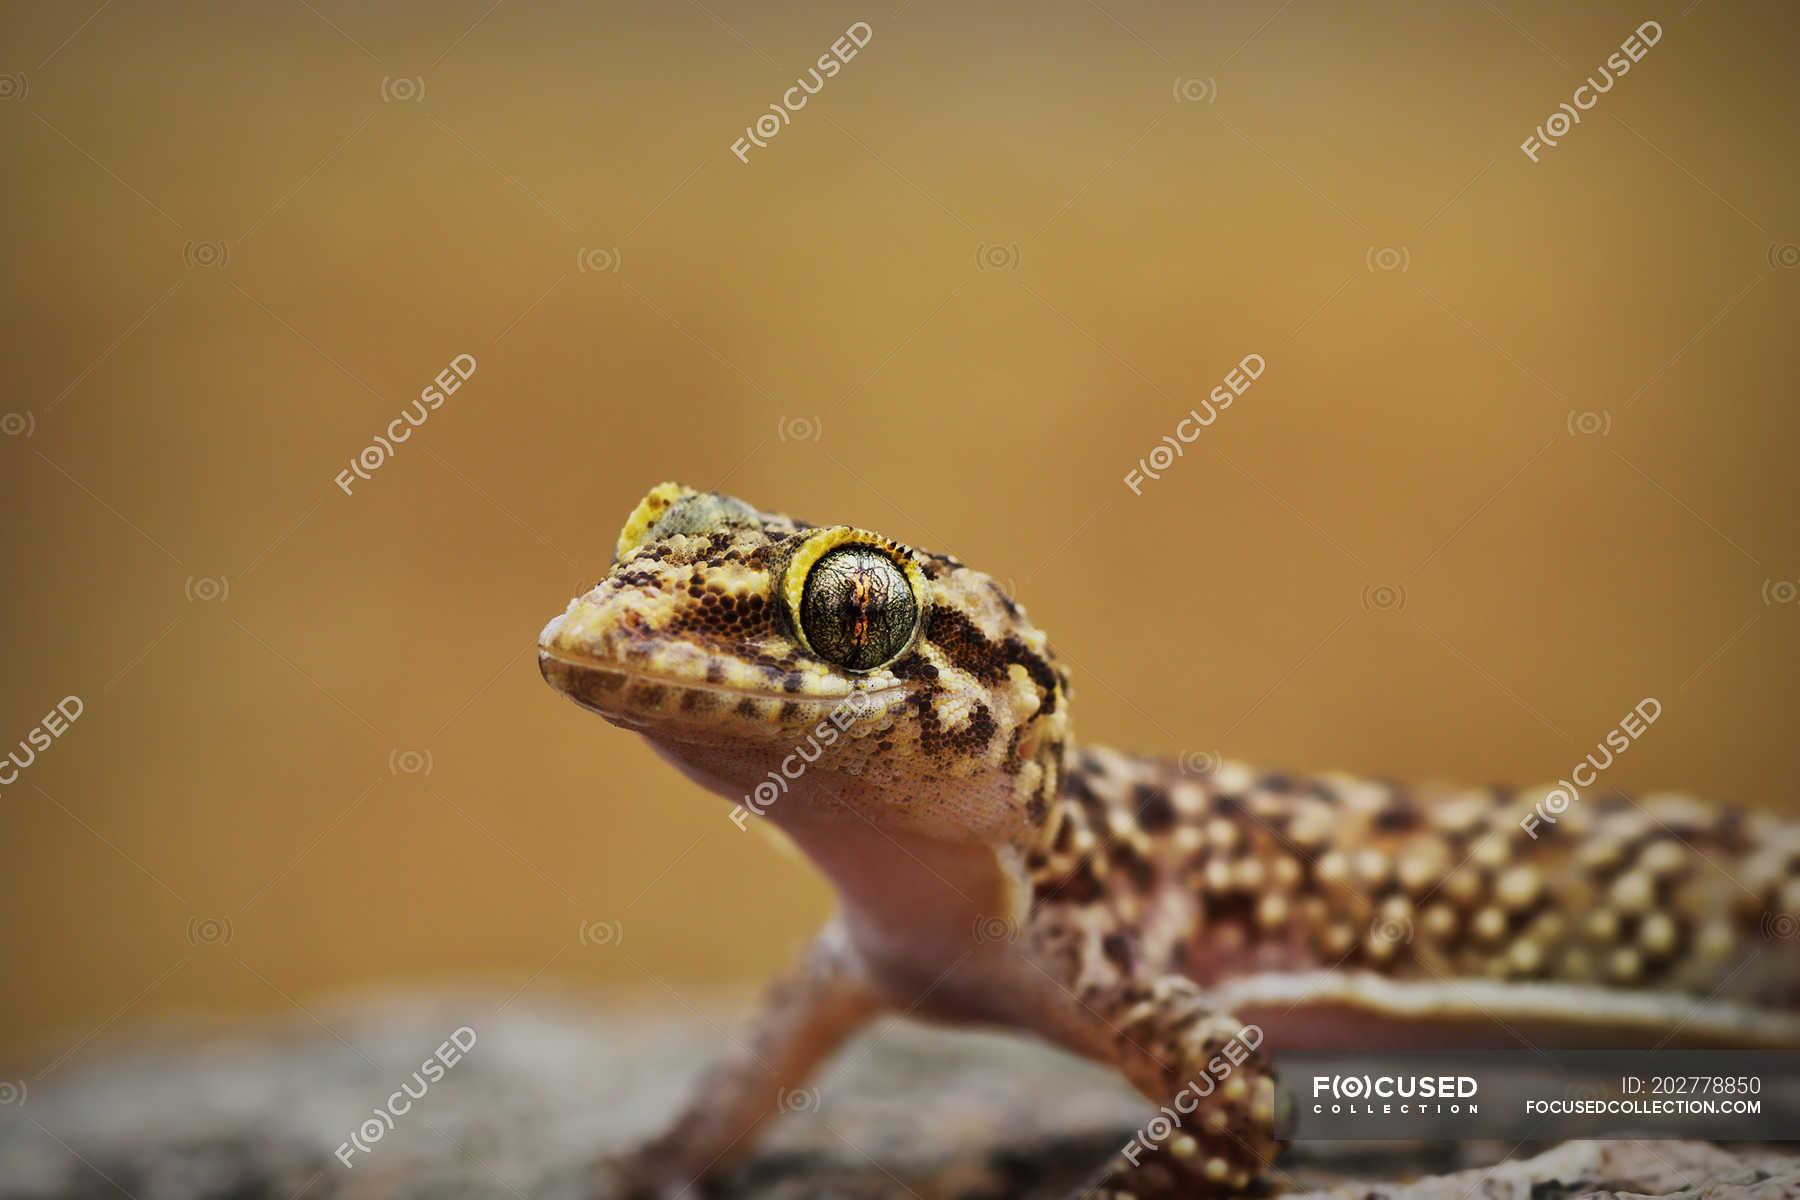 Curious Mediterranean House Gecko Lizard One Animal Animal Body